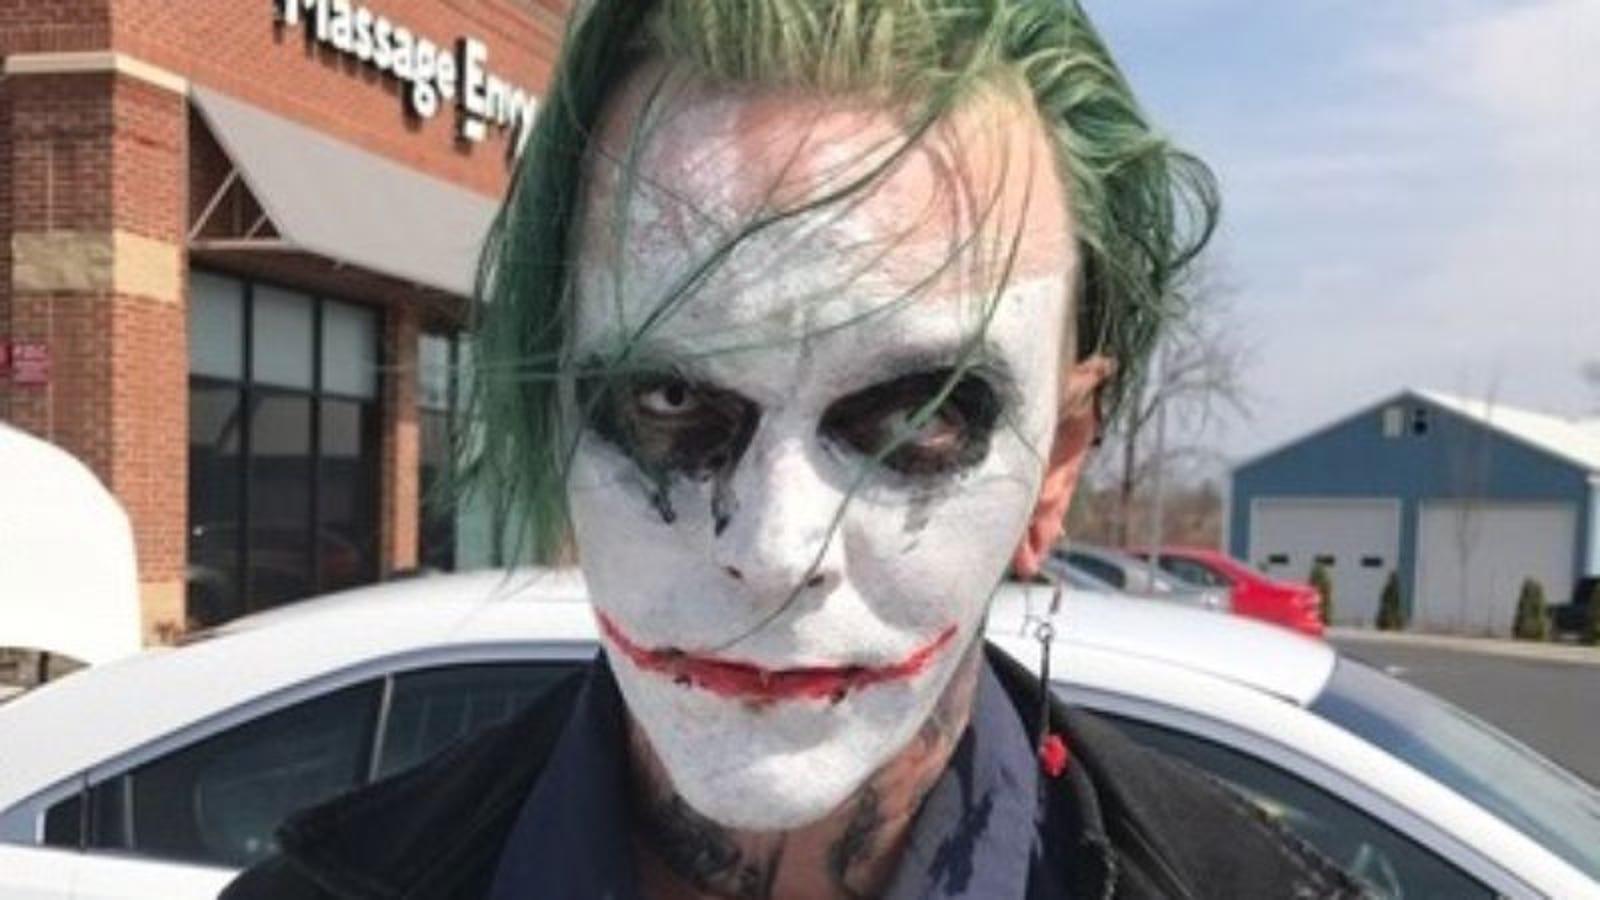 police arrest virginia man for wearing joker makeup in public